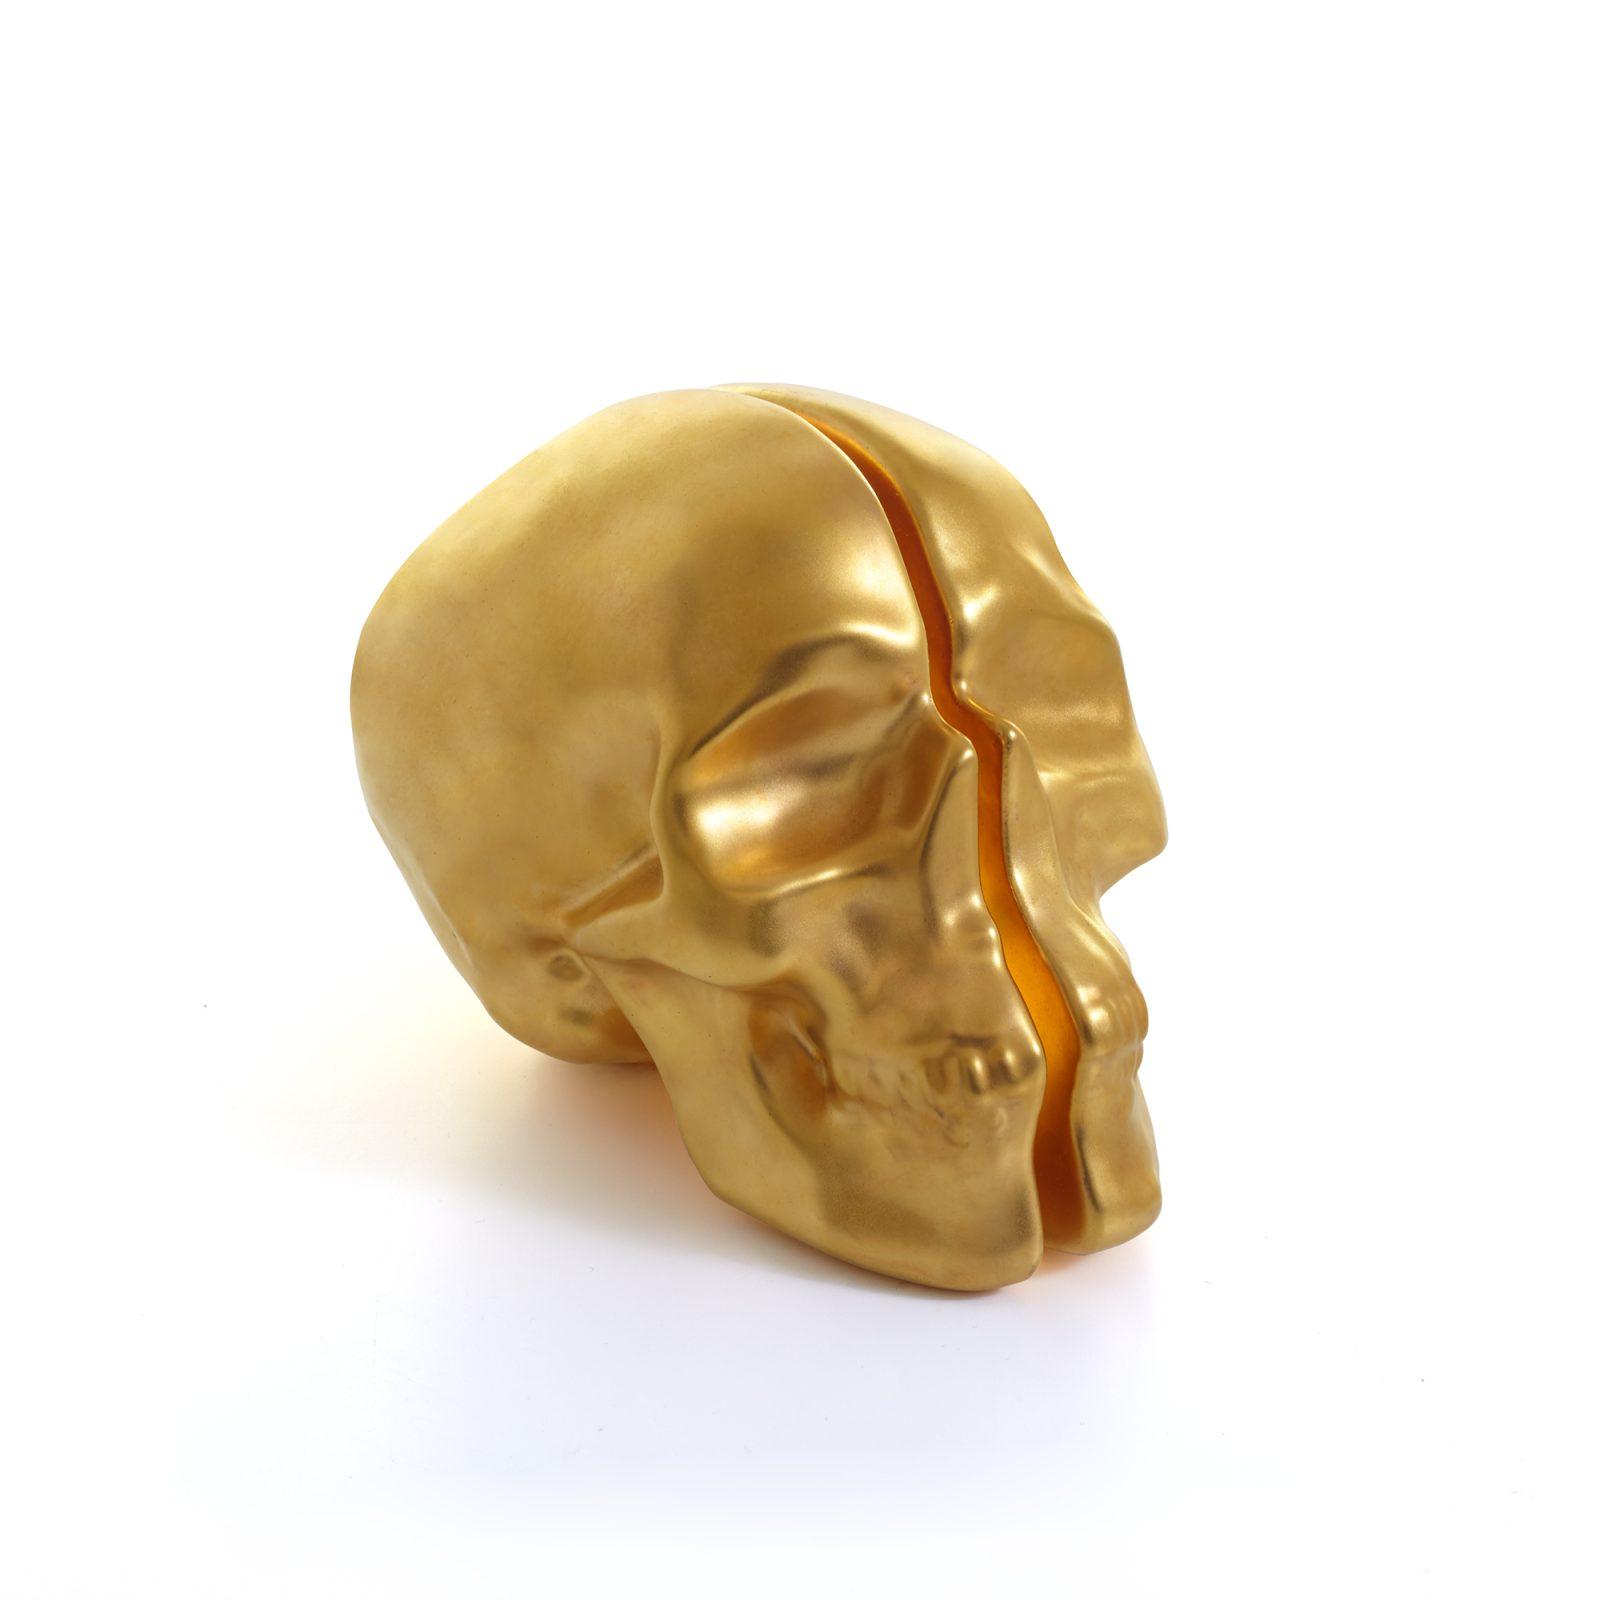 Yorick Skull Lamp, 24Kt Gold Hand Painted-34742